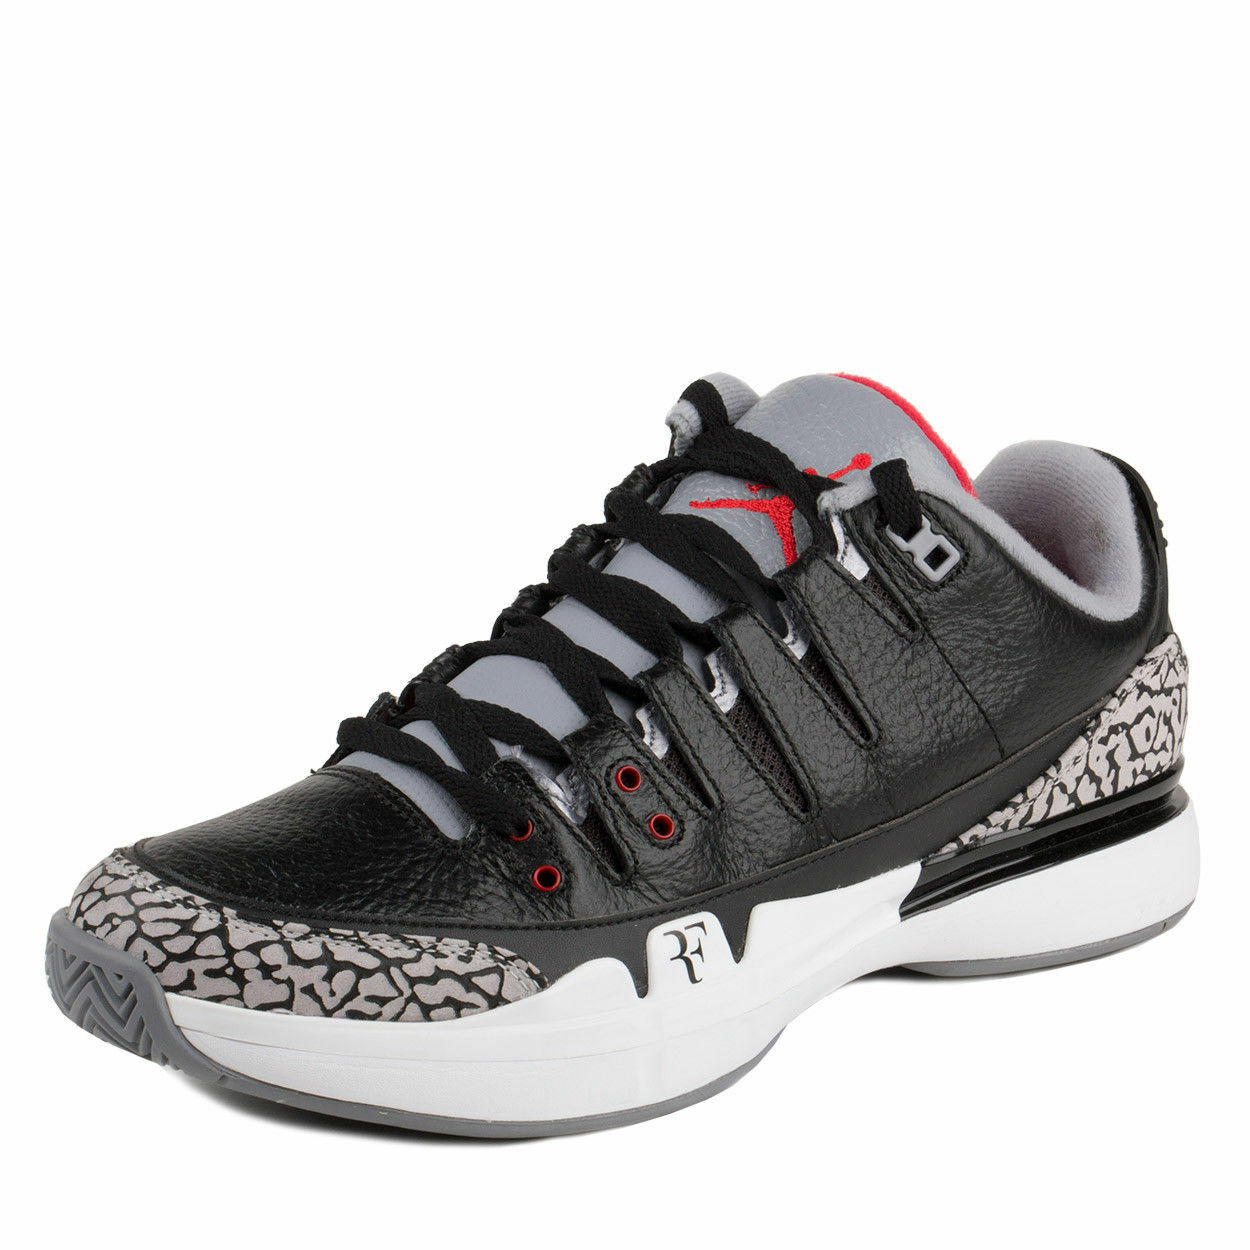 Nike Mens Zoom Vapor AJ3 Air Jordan Black White-Cement Grey 709998-010 Sz 8